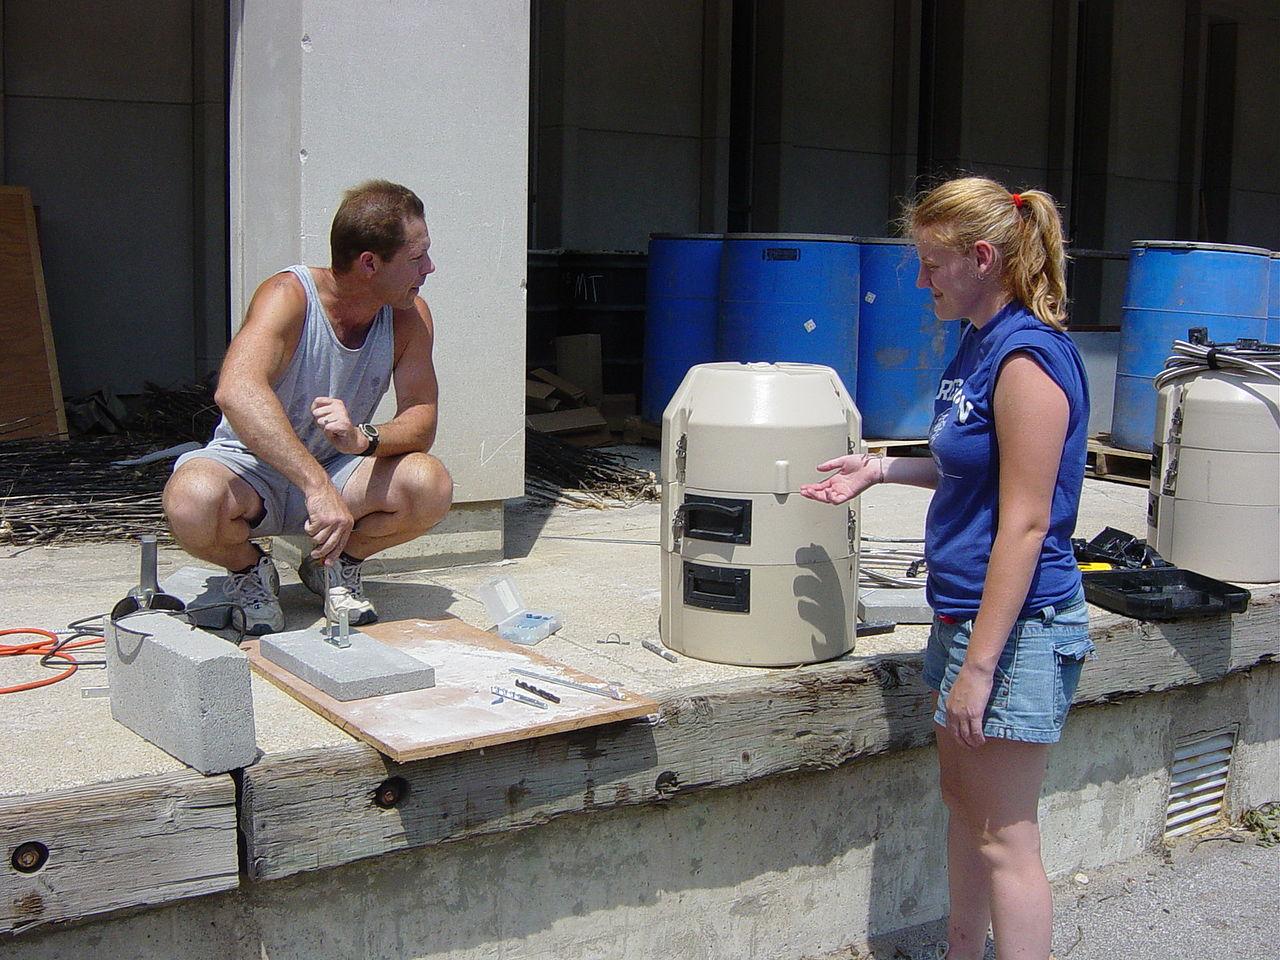 File:Research- water sampling equipment jpg - Wikimedia Commons